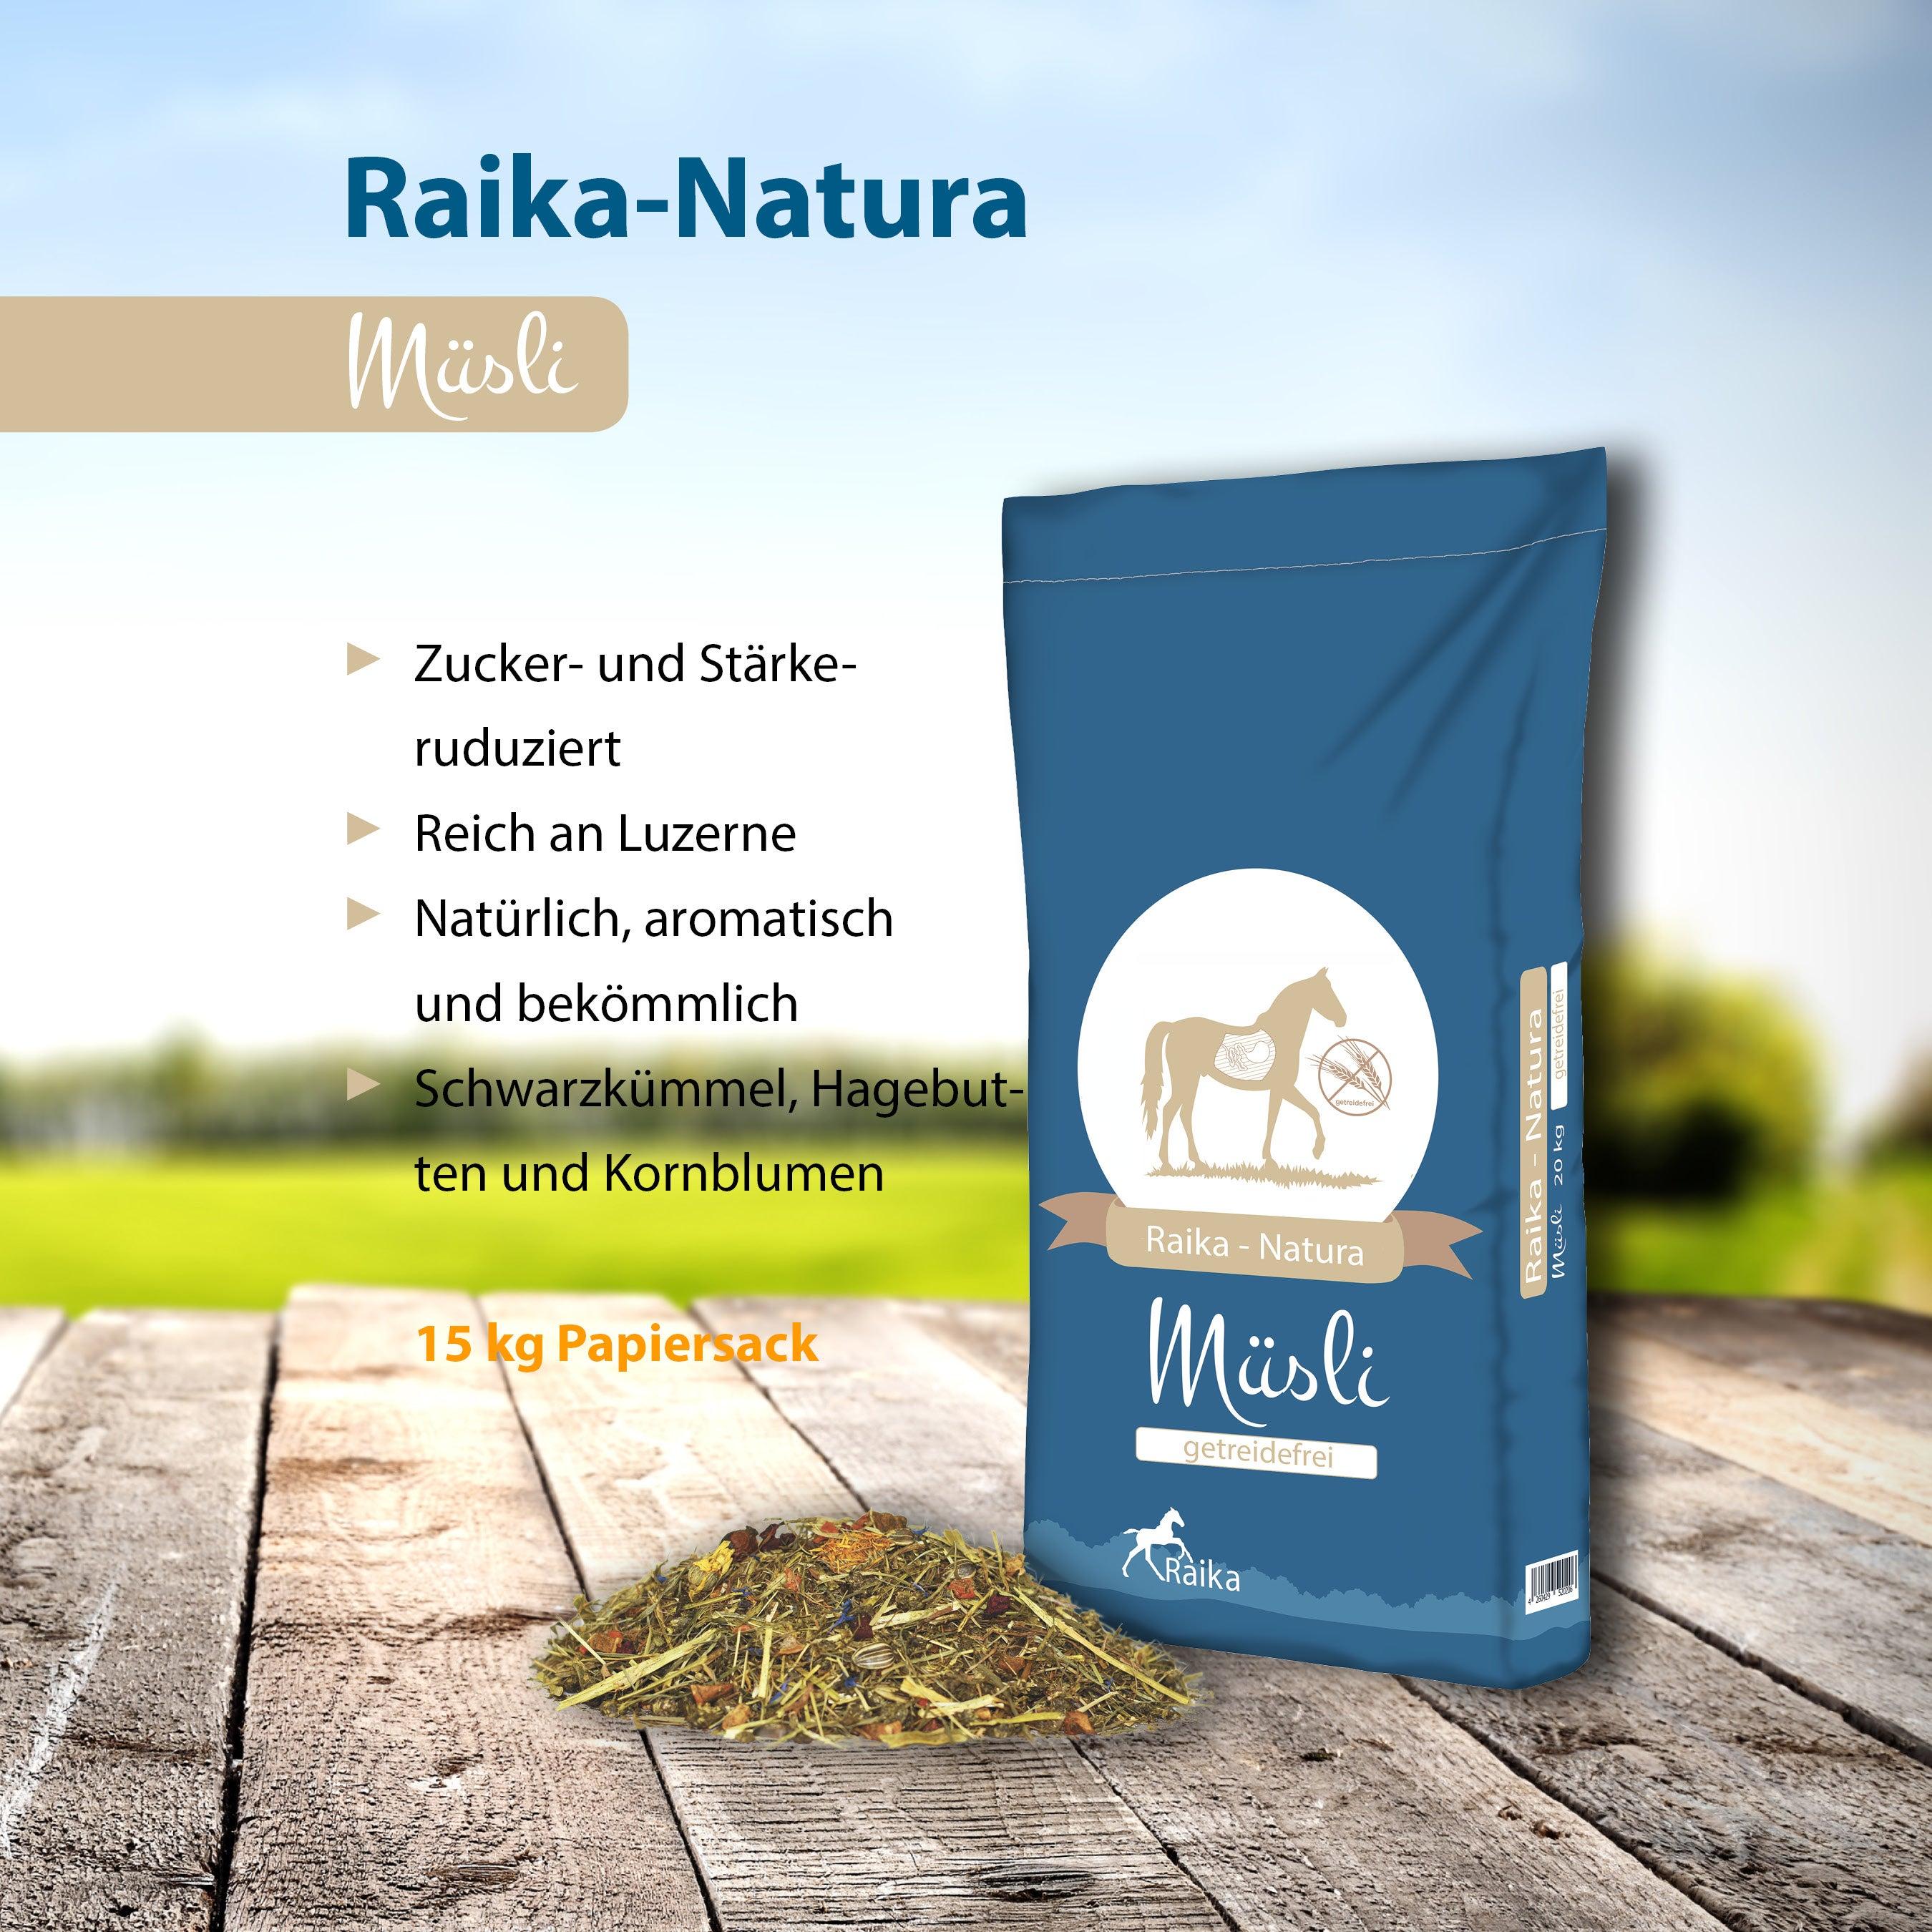 Raika-Natura Müsli Pferdefutter